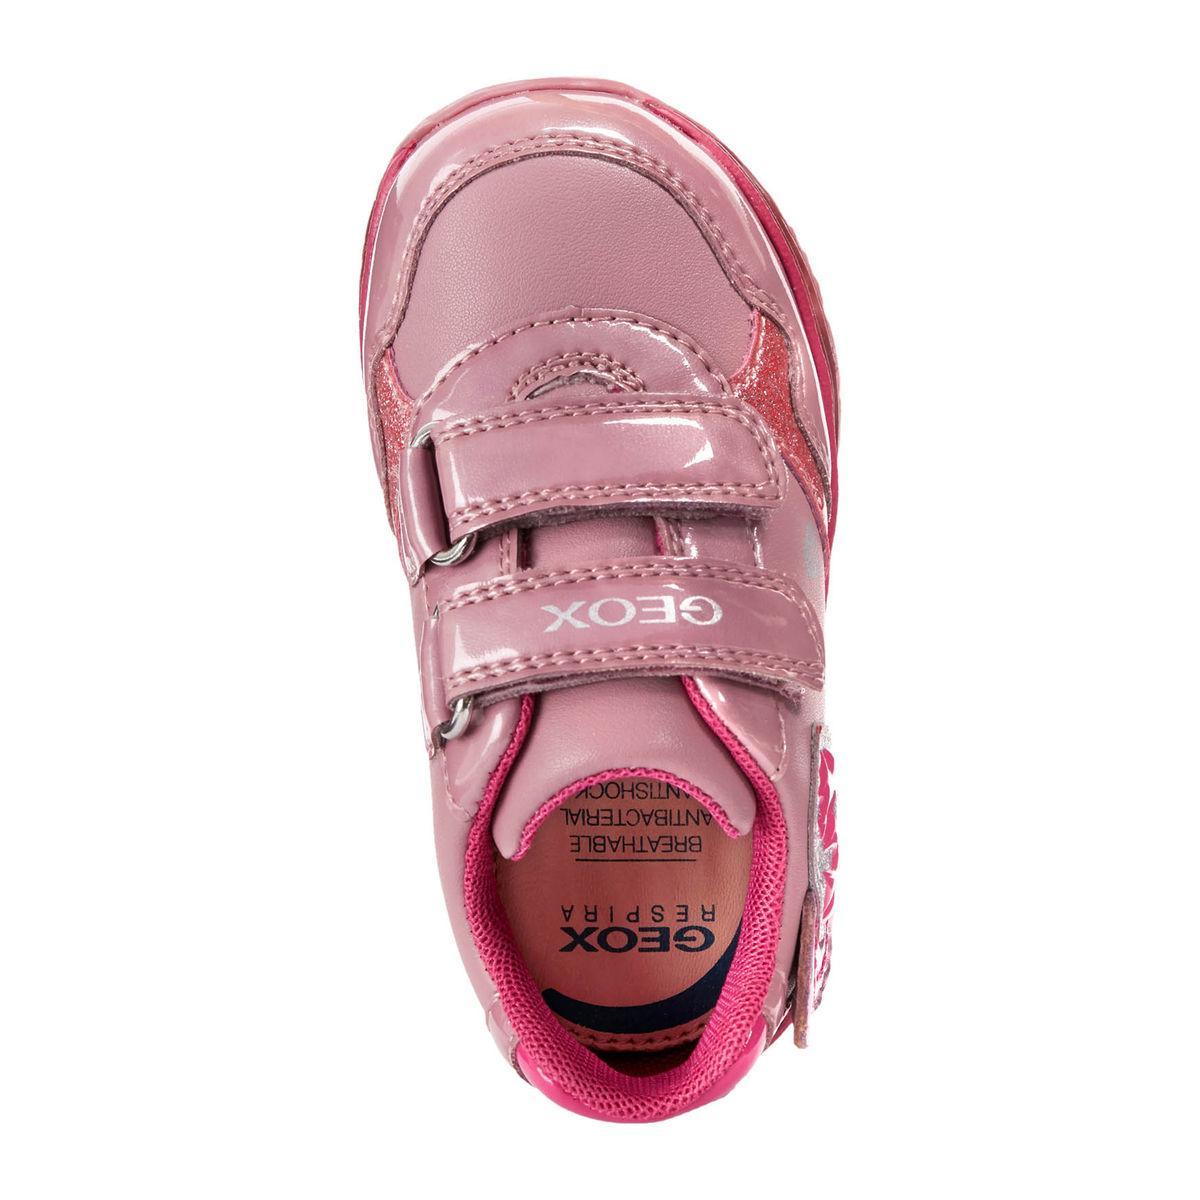 e9dced53cc8cf Sneaker Geox Girl B8485a Ebay Baby Luci Todo daaAqvr